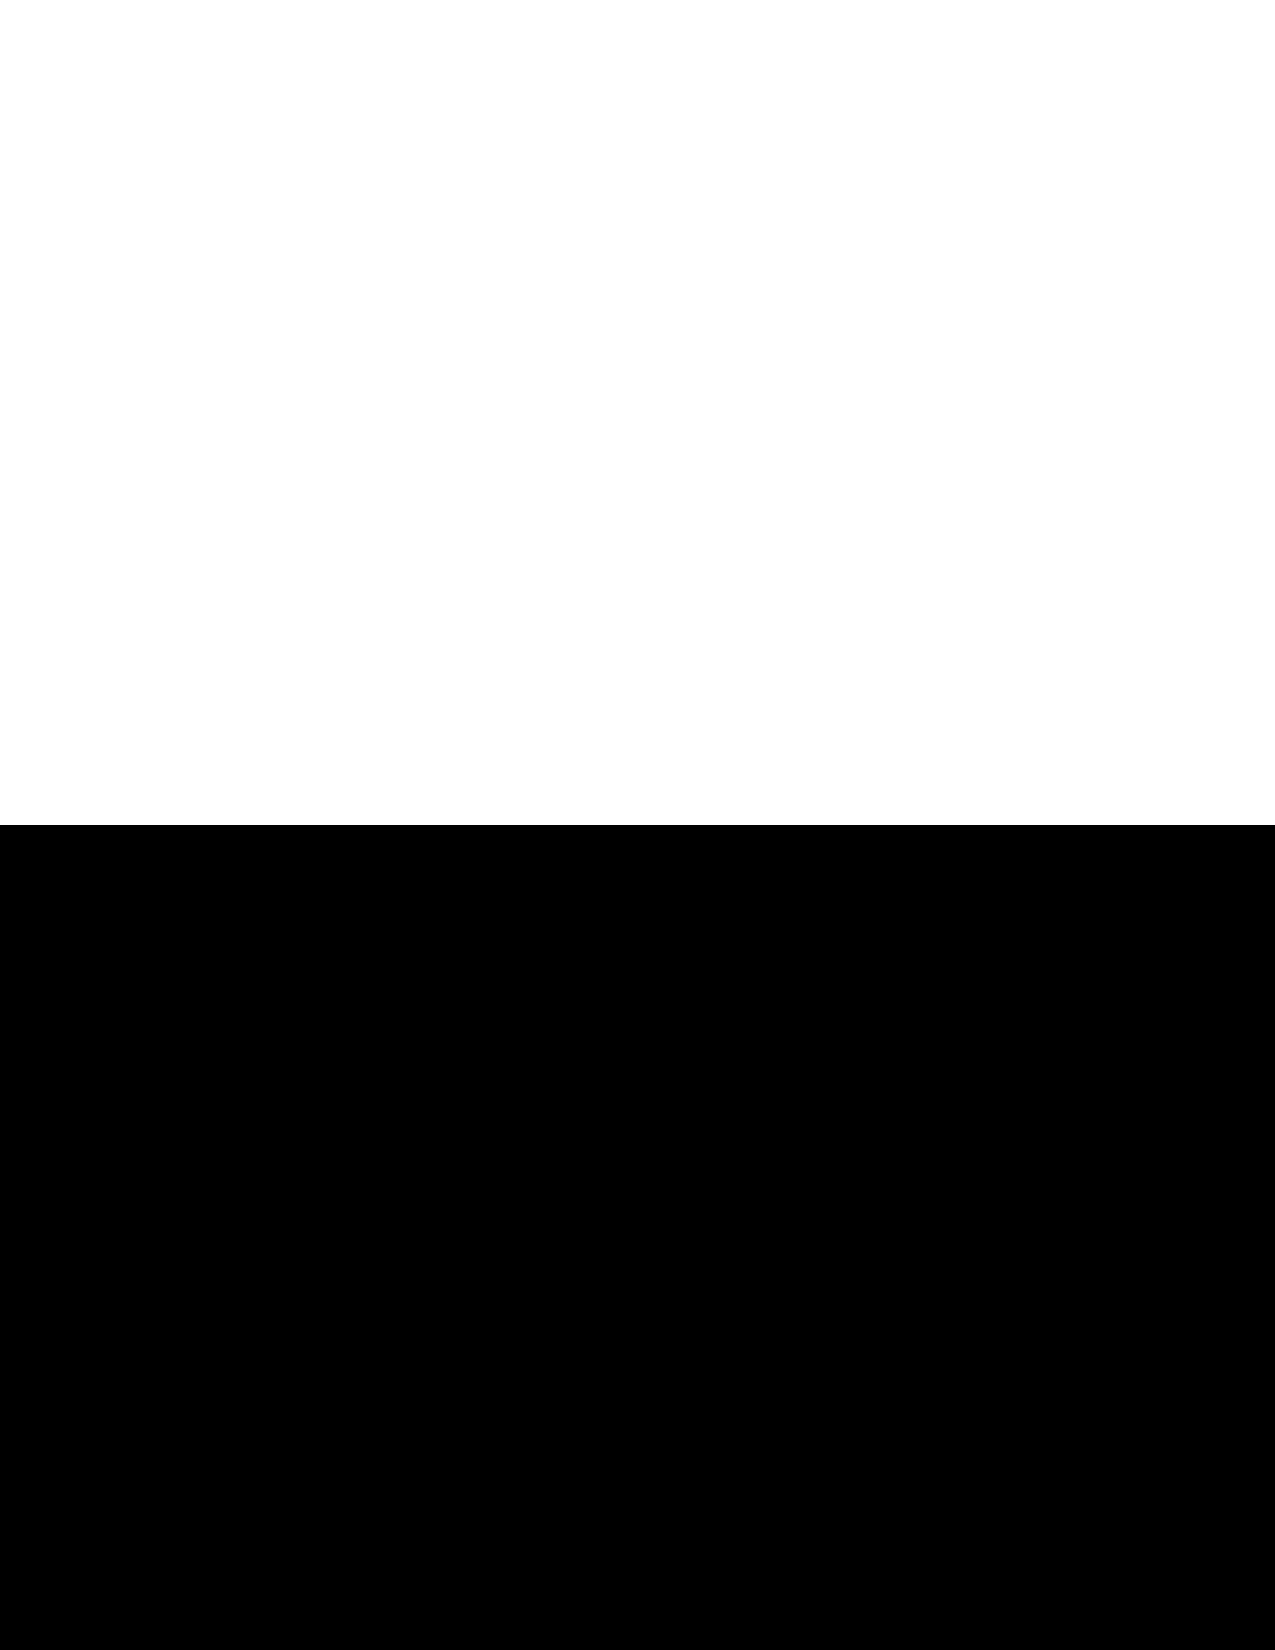 SOLUTION Fundamentals Of Interior Design Chapter 9 Vocabulary